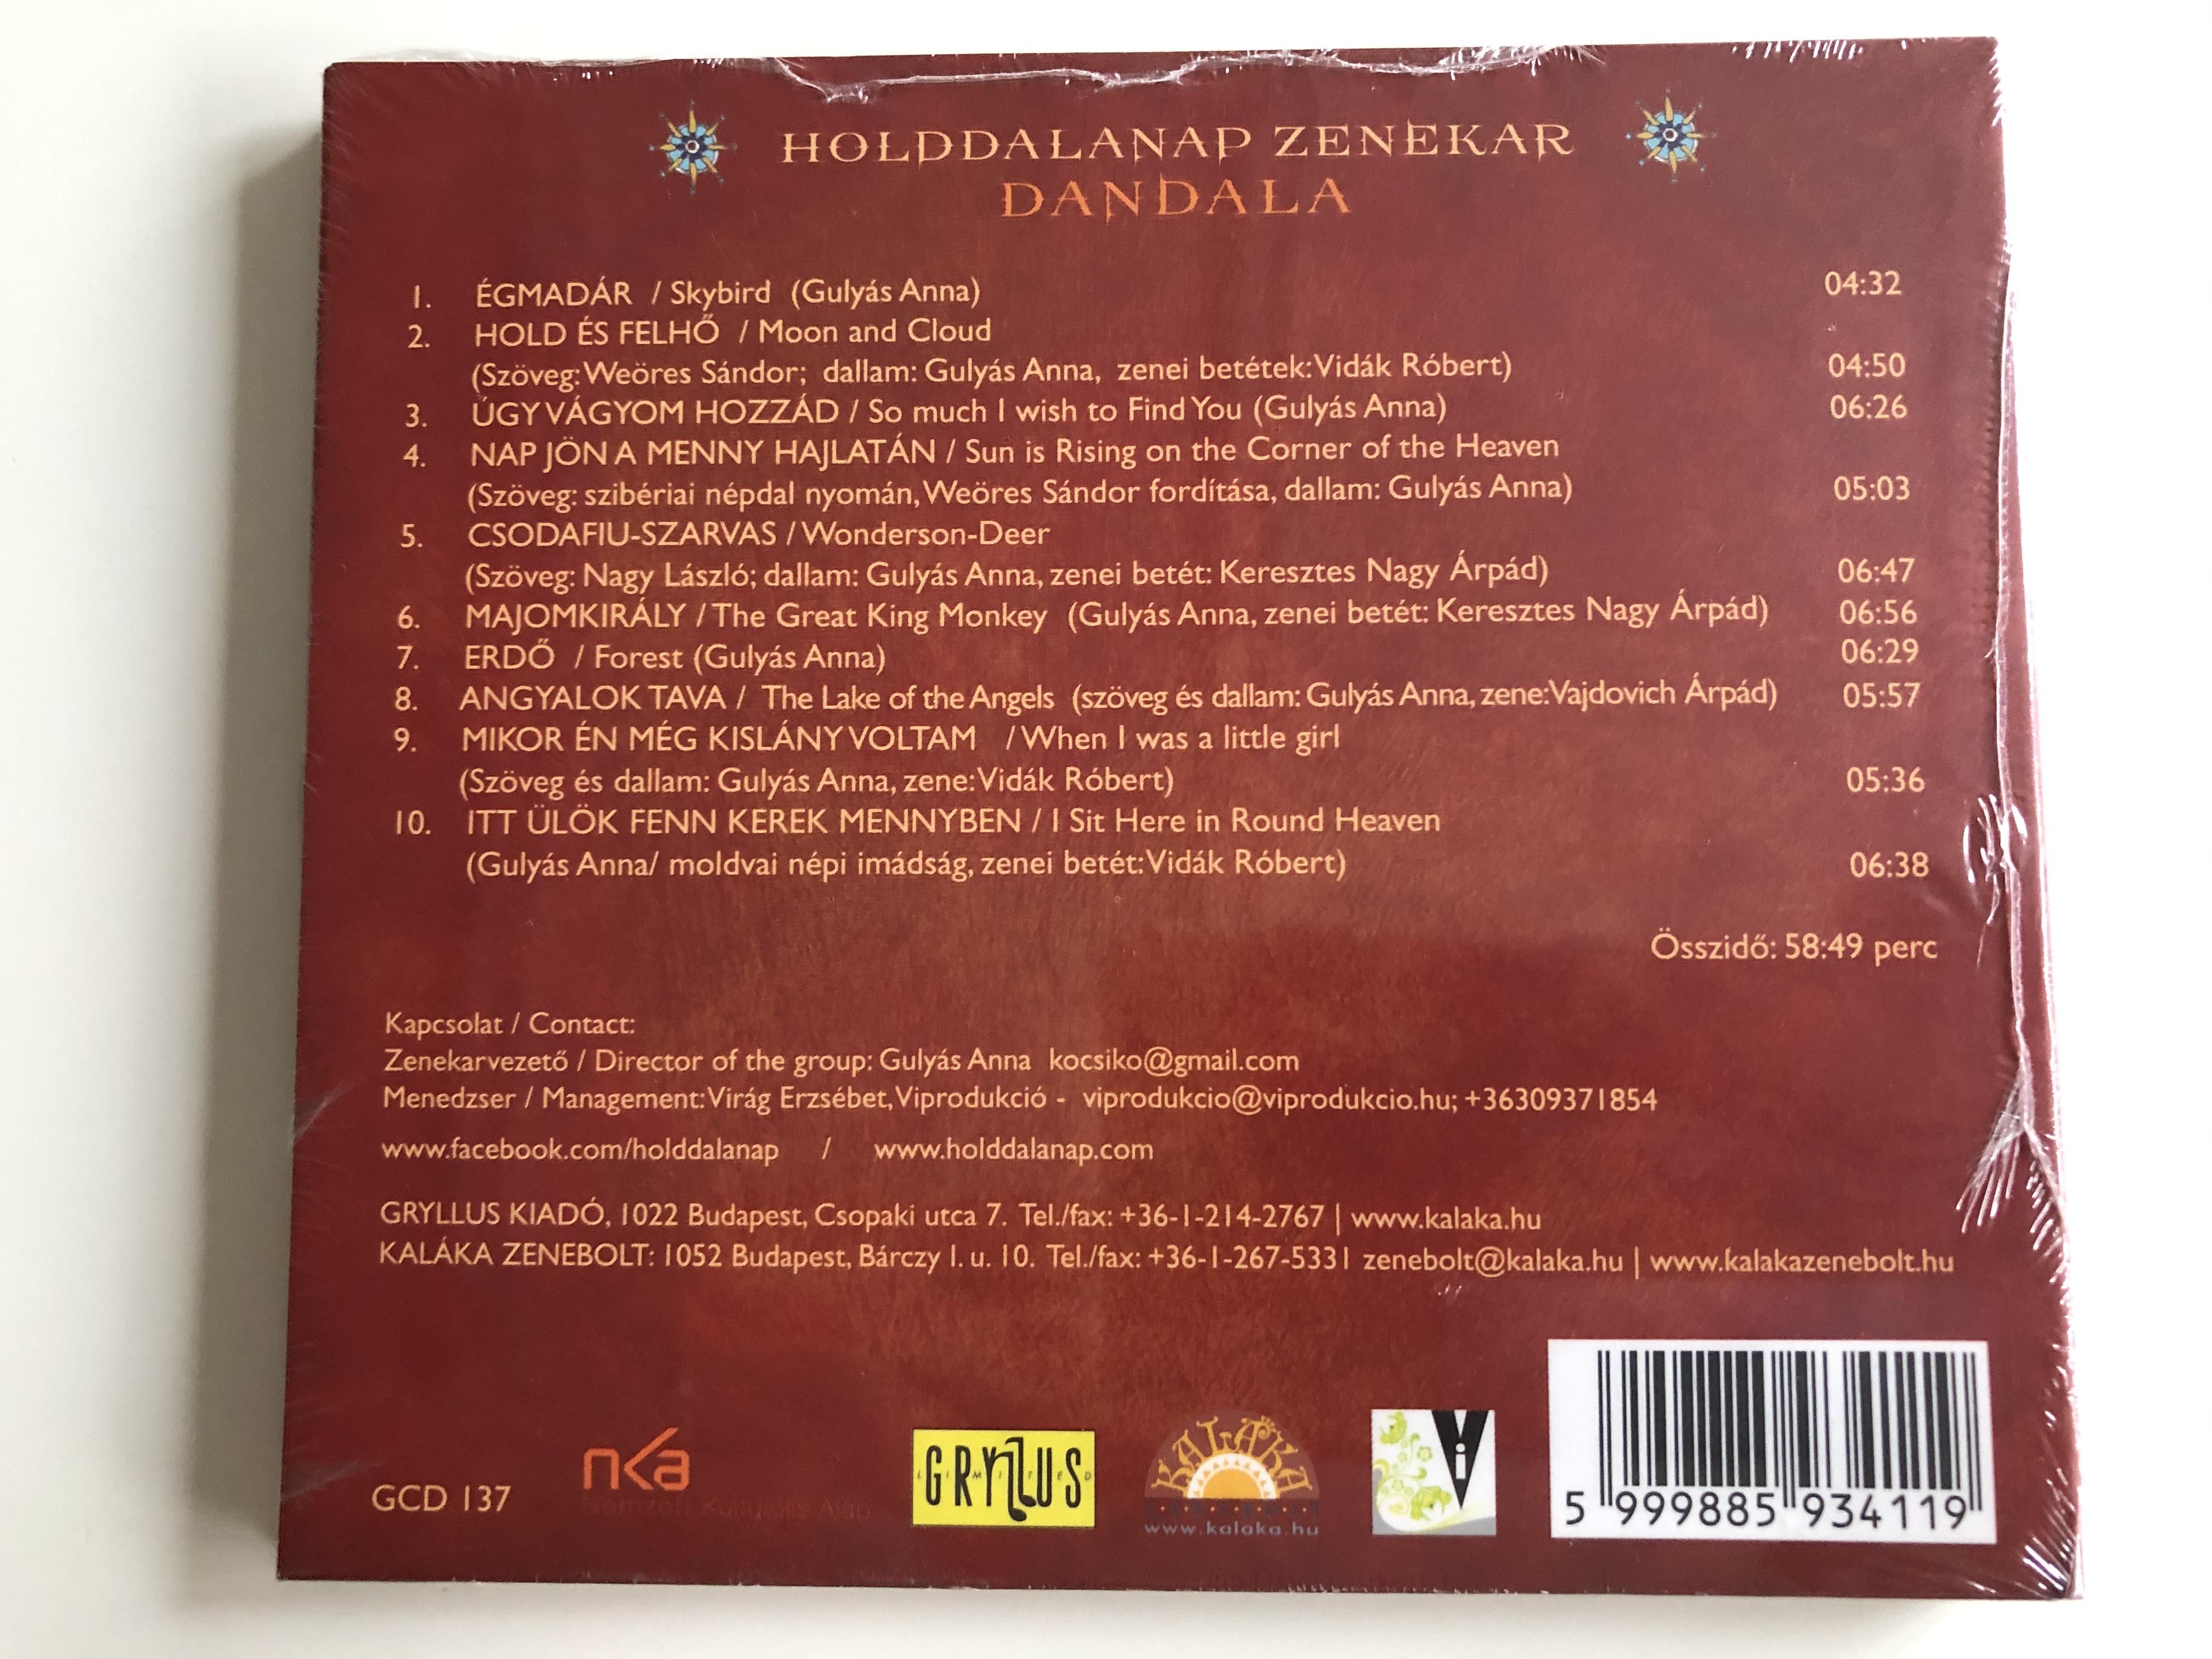 holddalanap-zenekar-dandala-gryllus-audio-cd-2014-gcd-137-2-.jpg